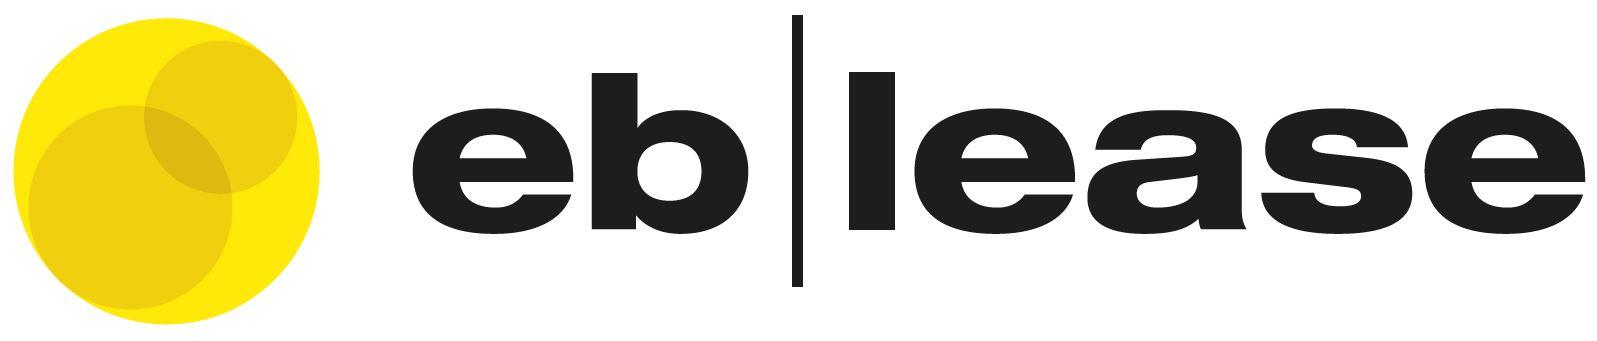 logo-eb-lease.jpg